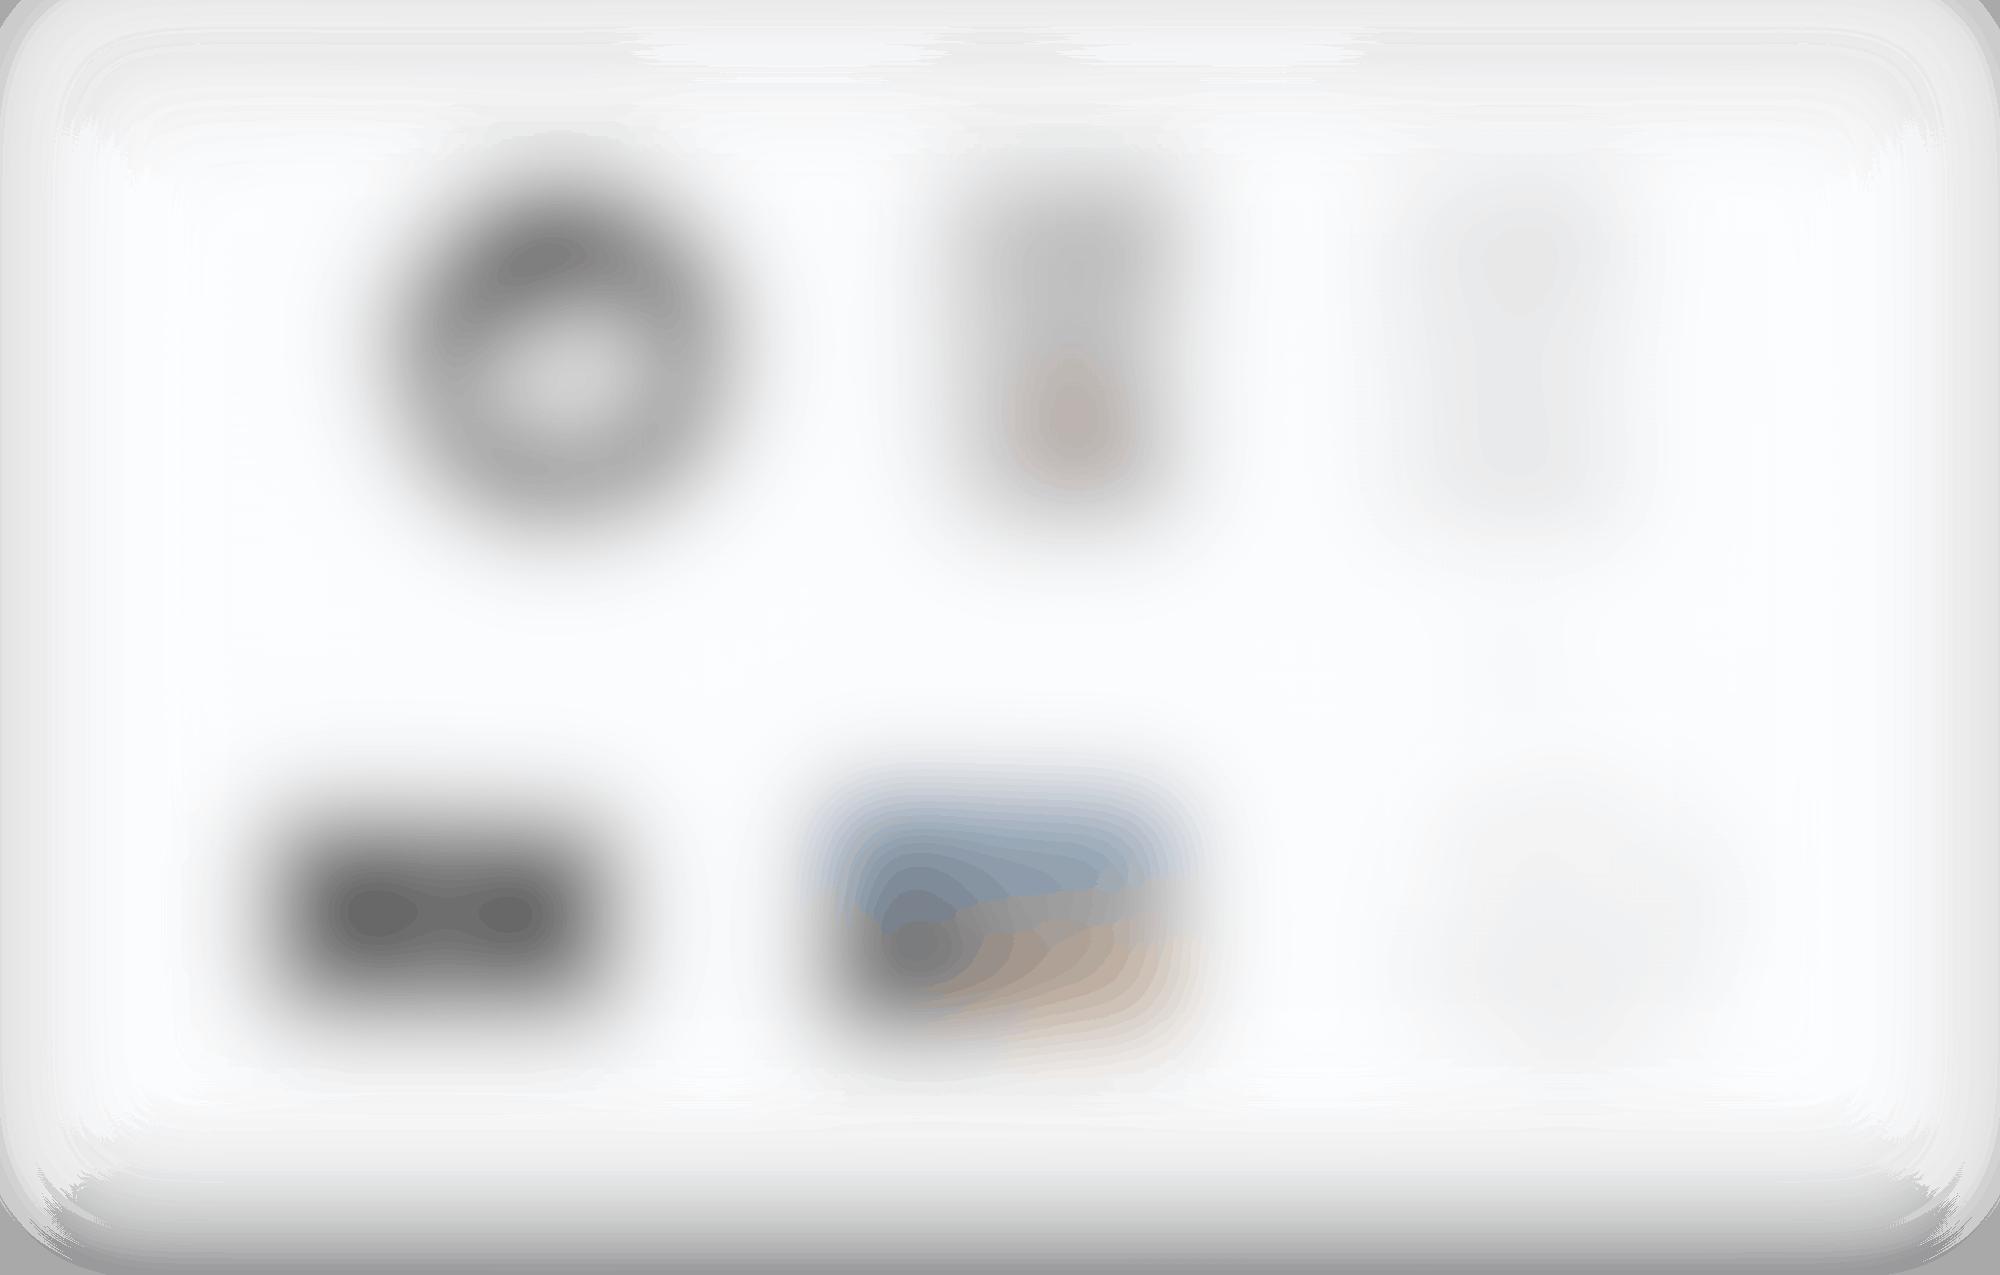 Yuli Serfaty Homepage1 1 autocompressfitresizeixlibphp 1 1 0max h2000max w3 D2000q80s5b4faaa613a349986f5189c3e4ee943c